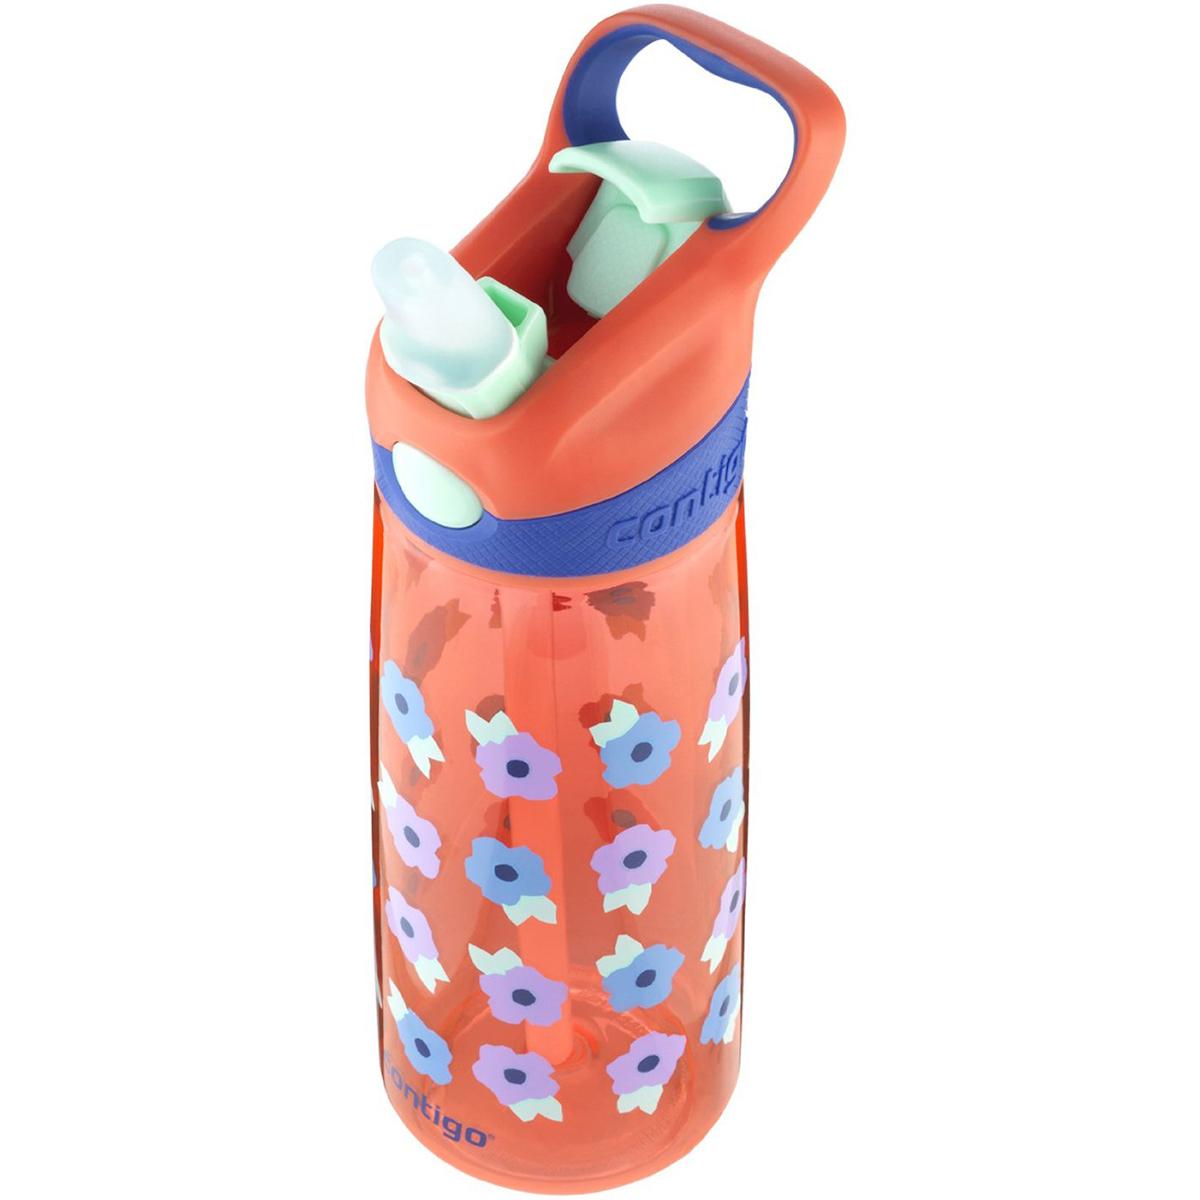 Contigo-20-oz-Kid-039-s-Striker-Autospout-Water-Bottle miniatuur 13